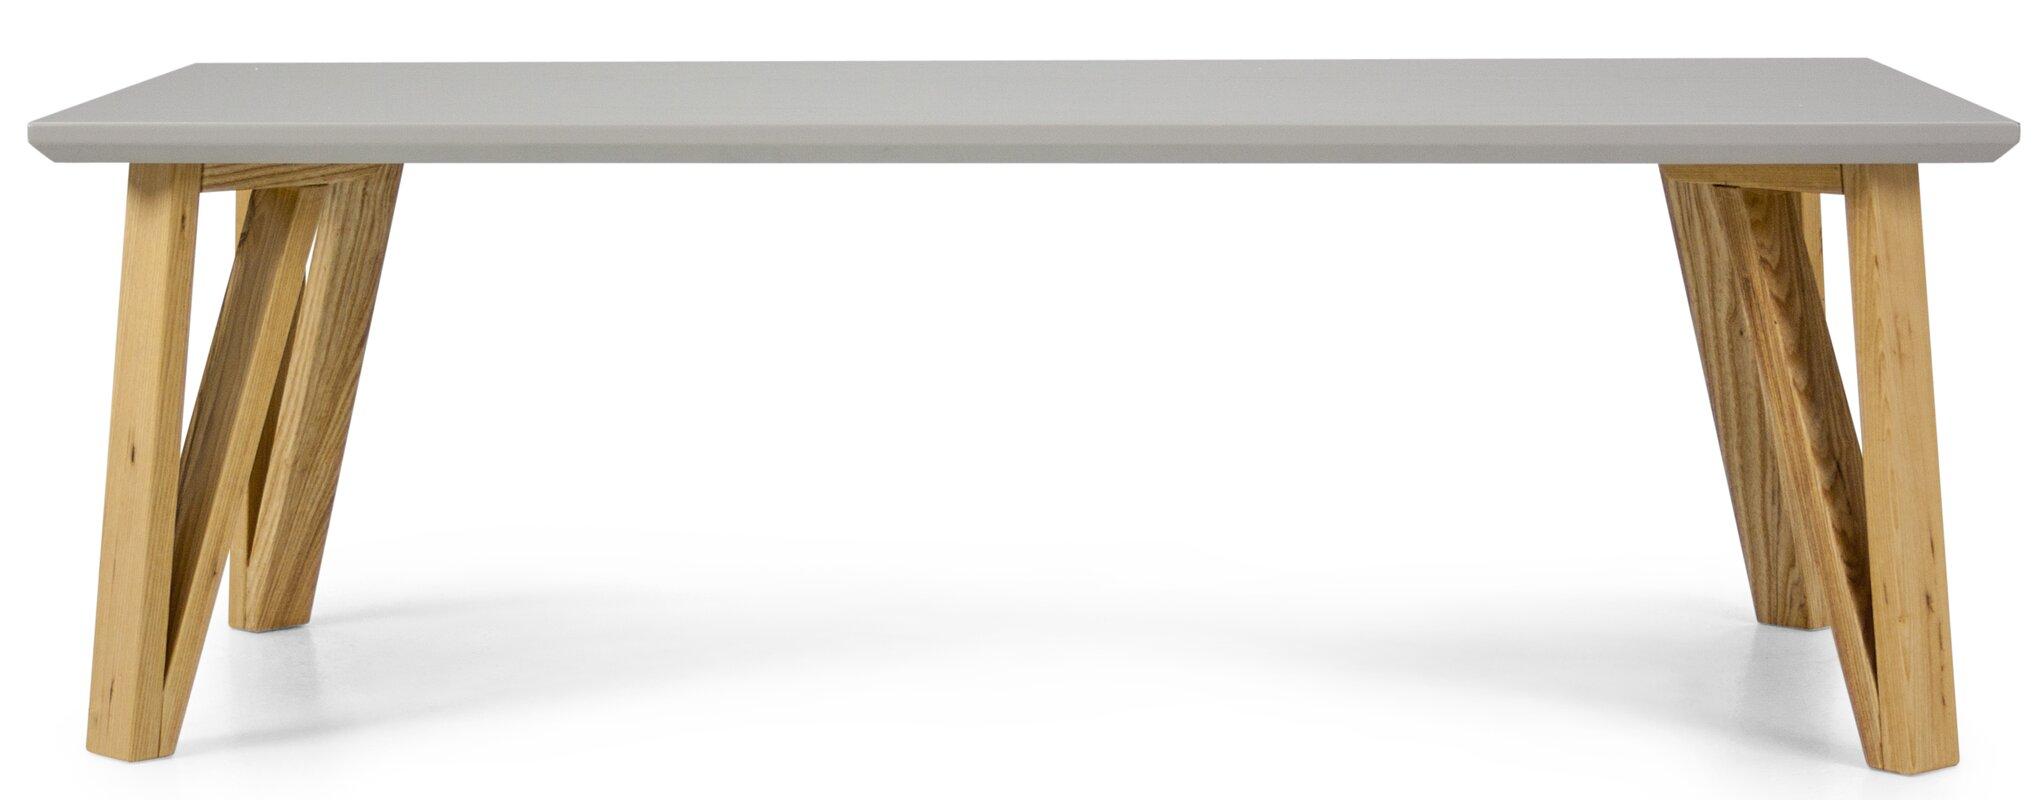 Tenzo cross designer coffee table reviews wayfair cross designer coffee table geotapseo Images